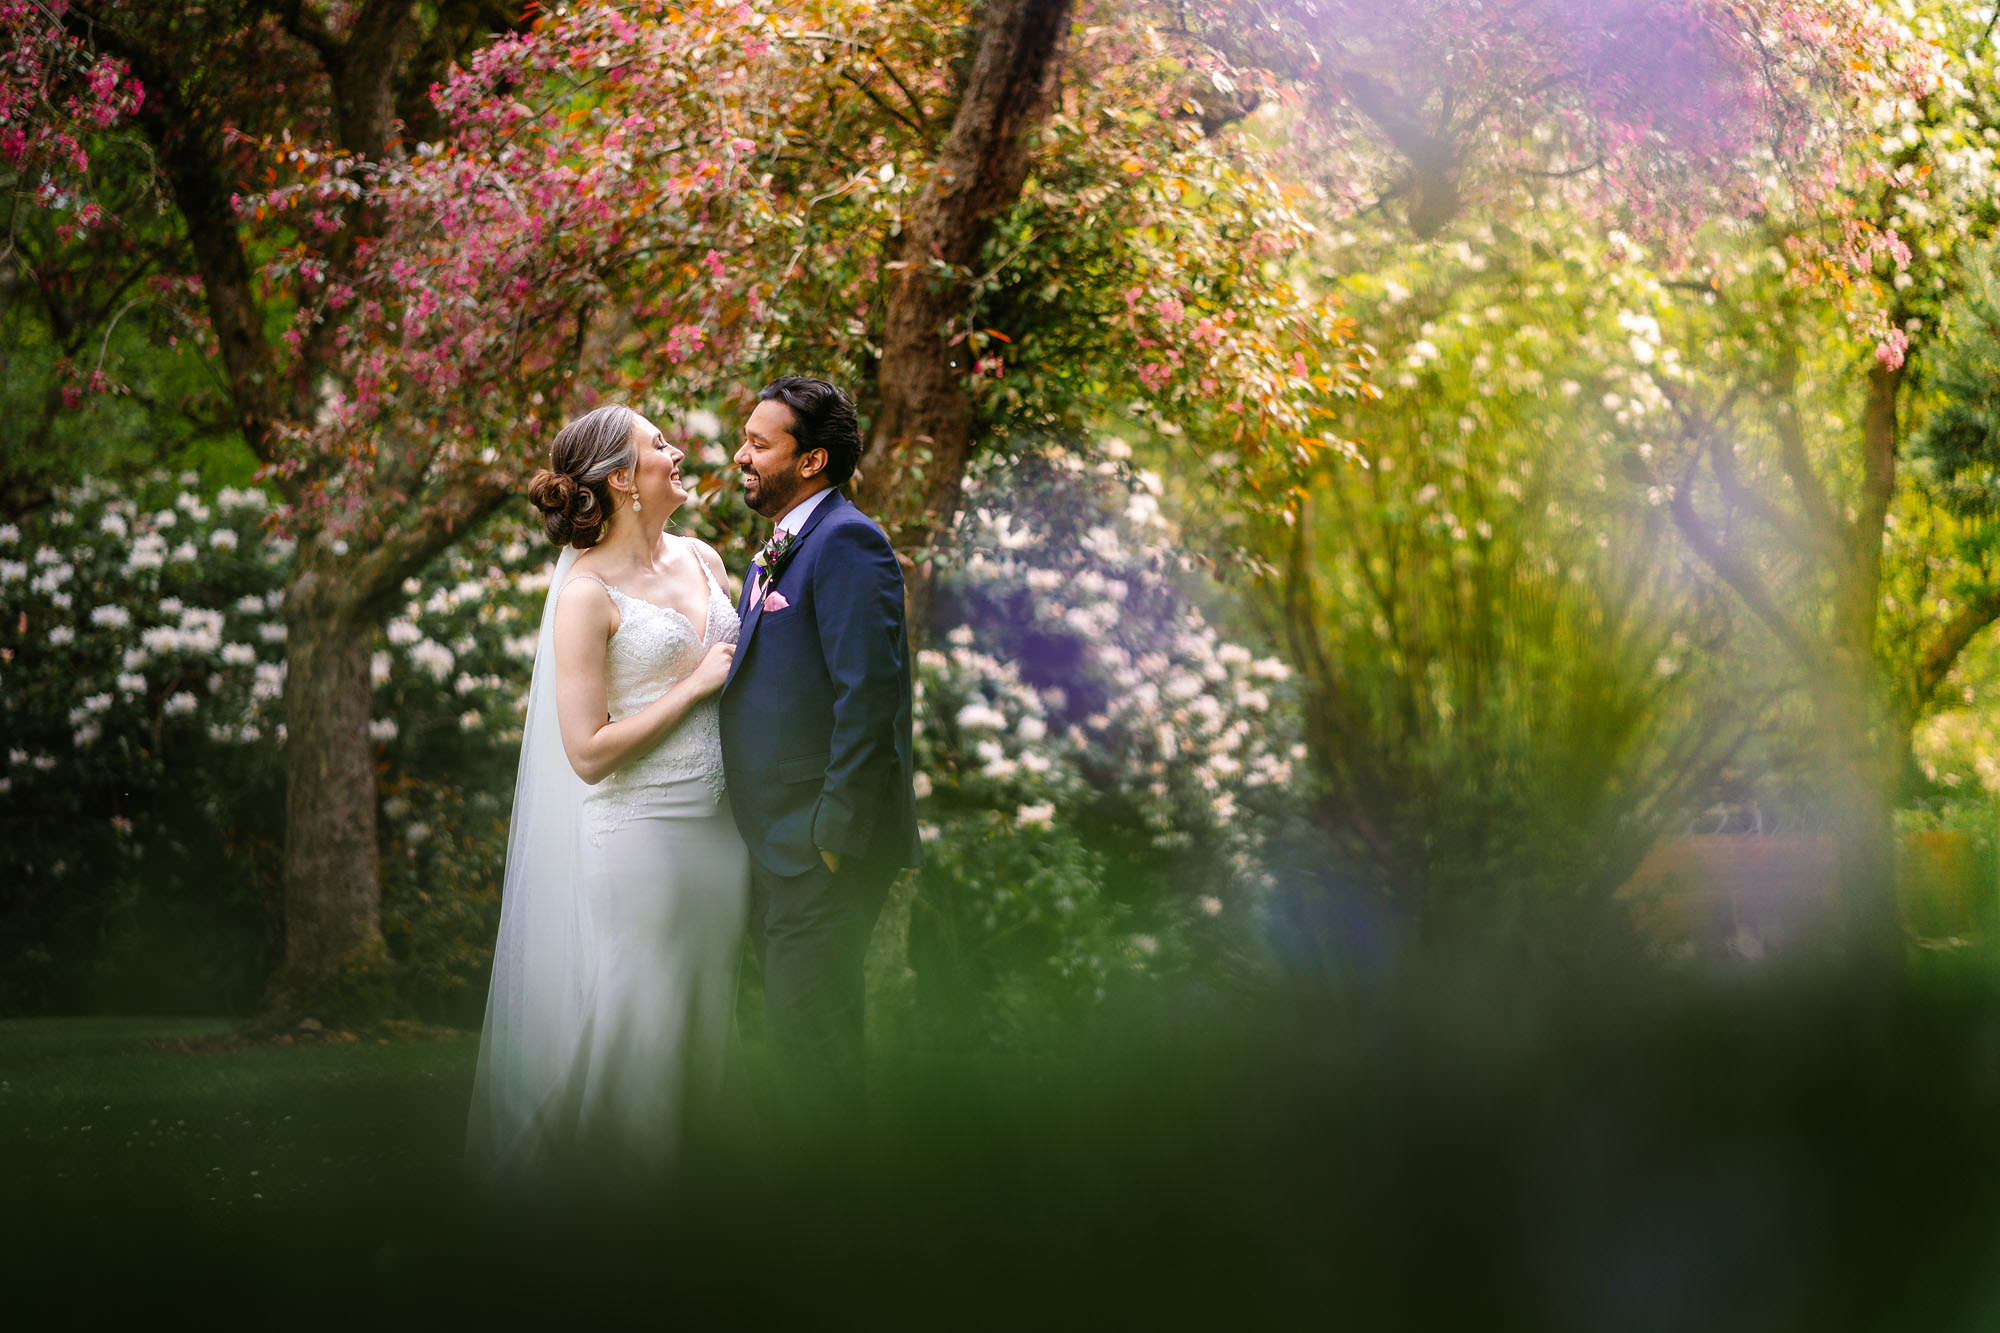 Emily & Dil's Covid mini wedding